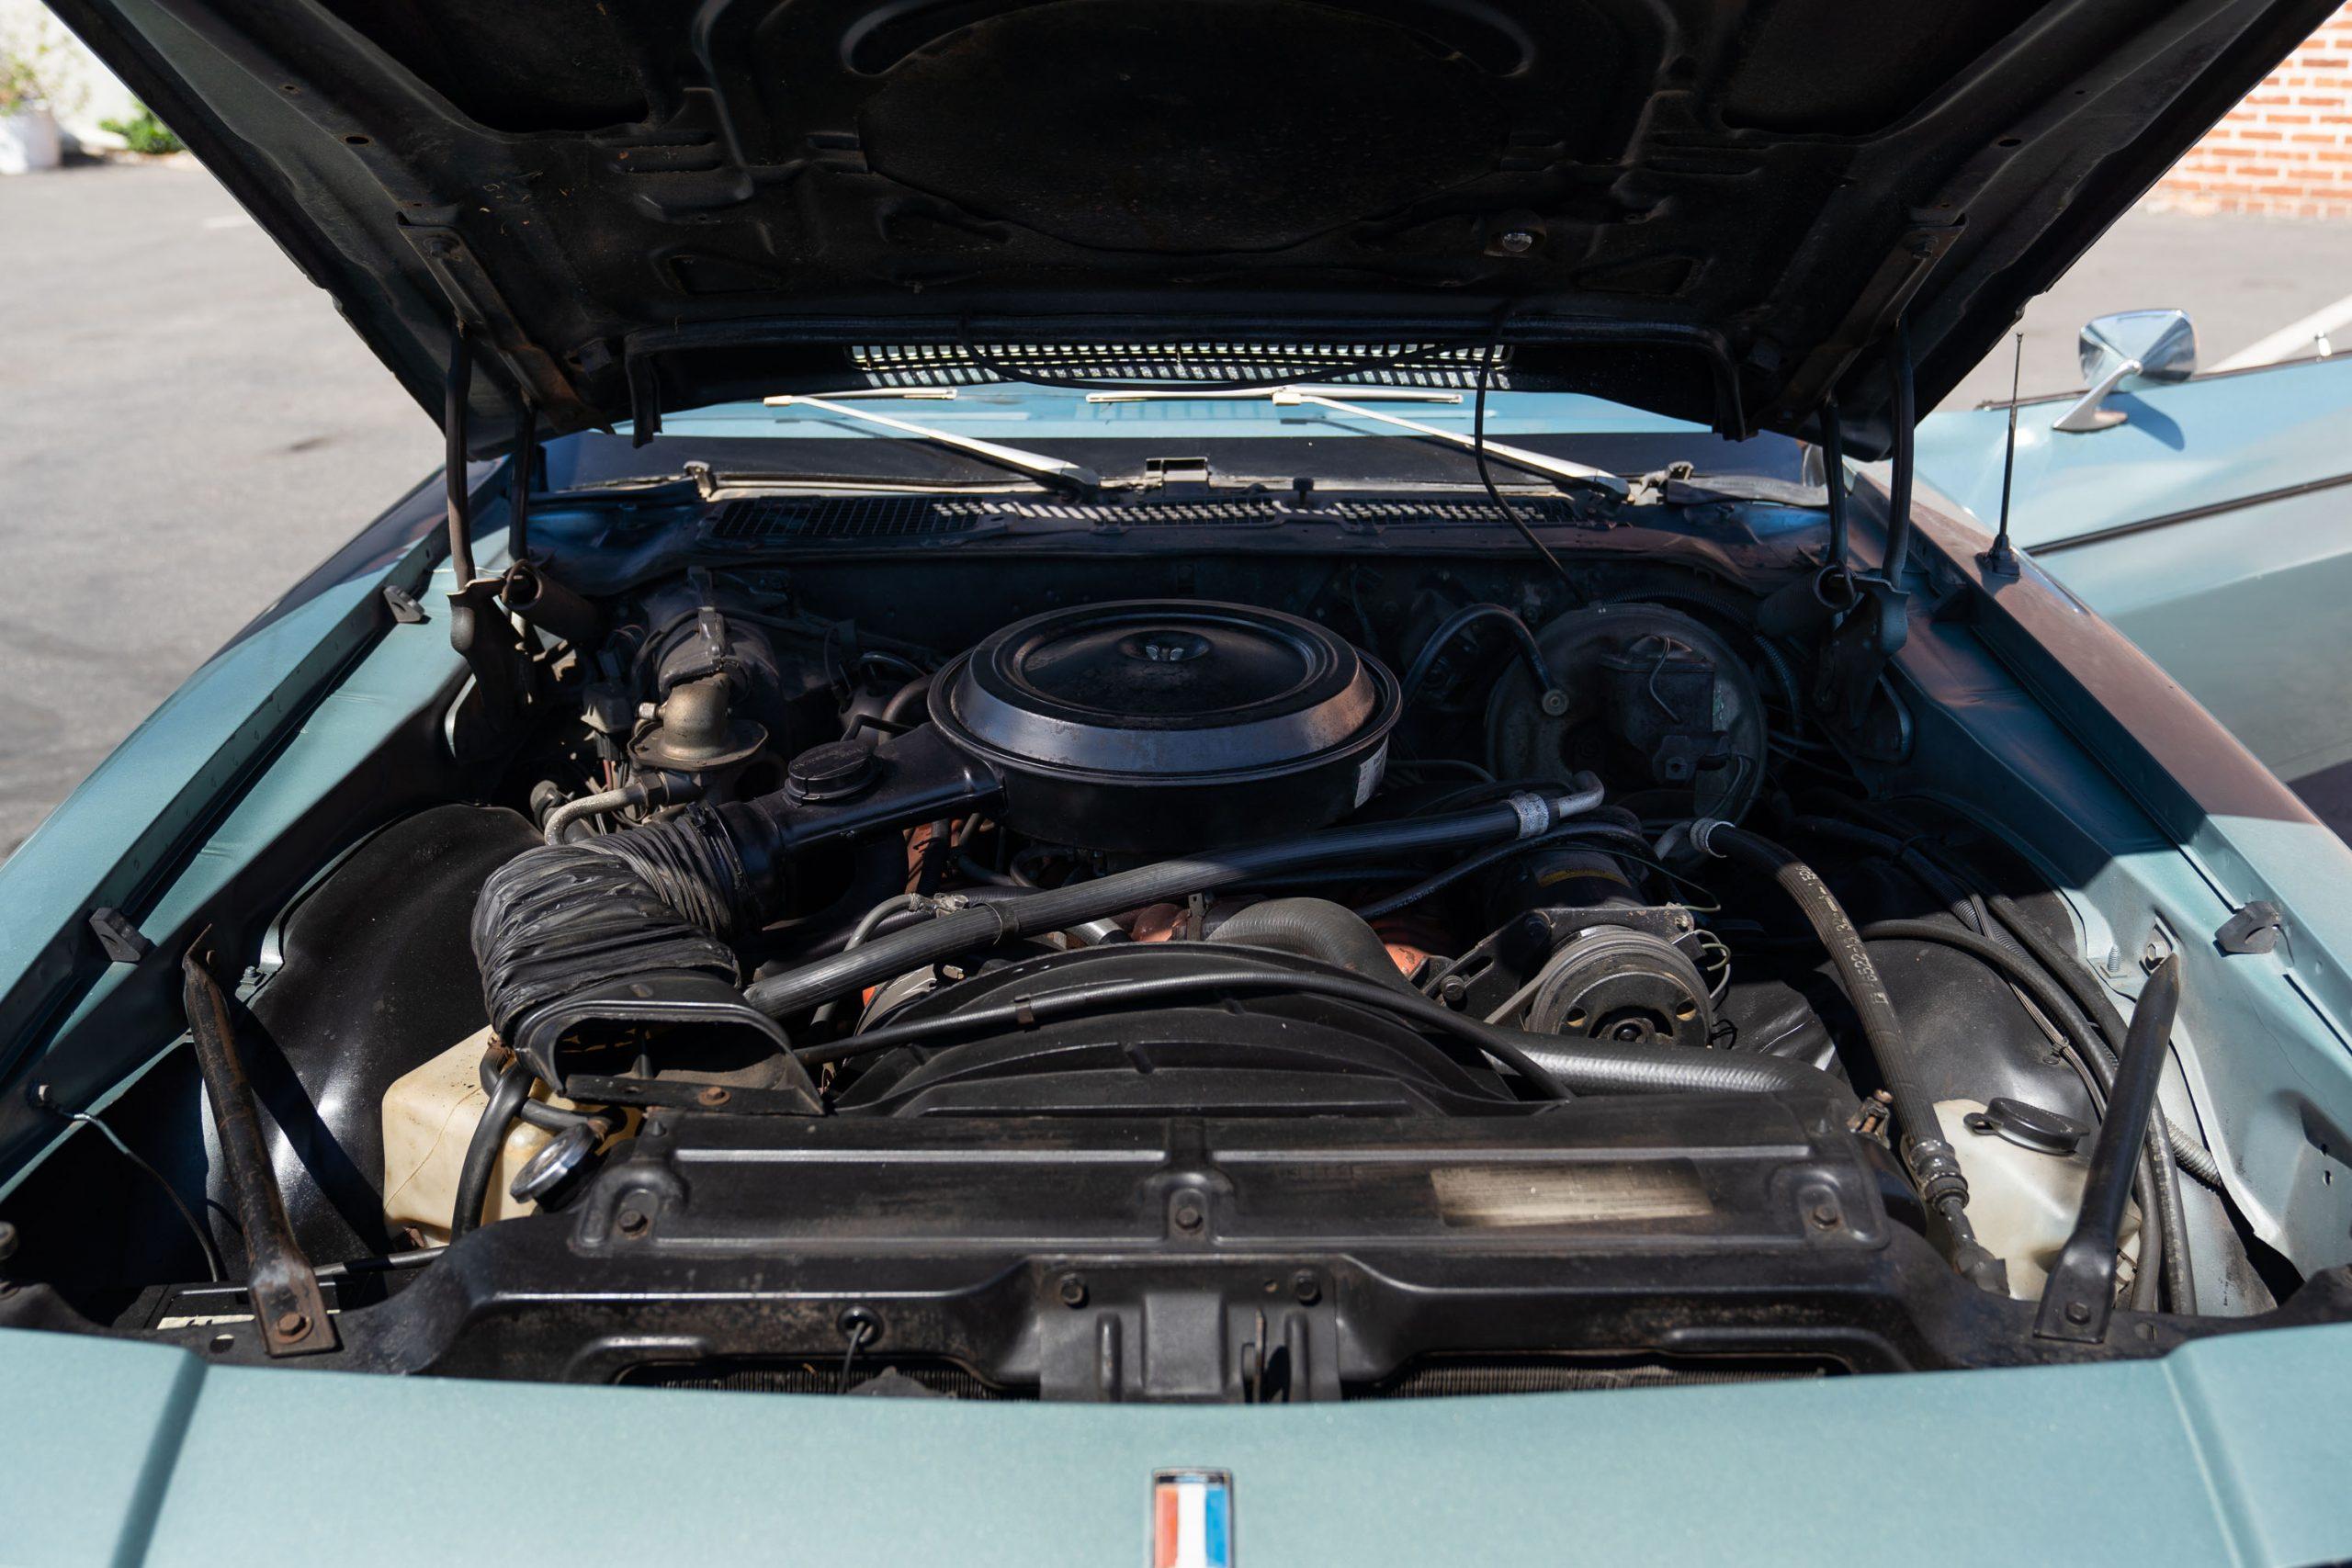 Europo Hurst engine front